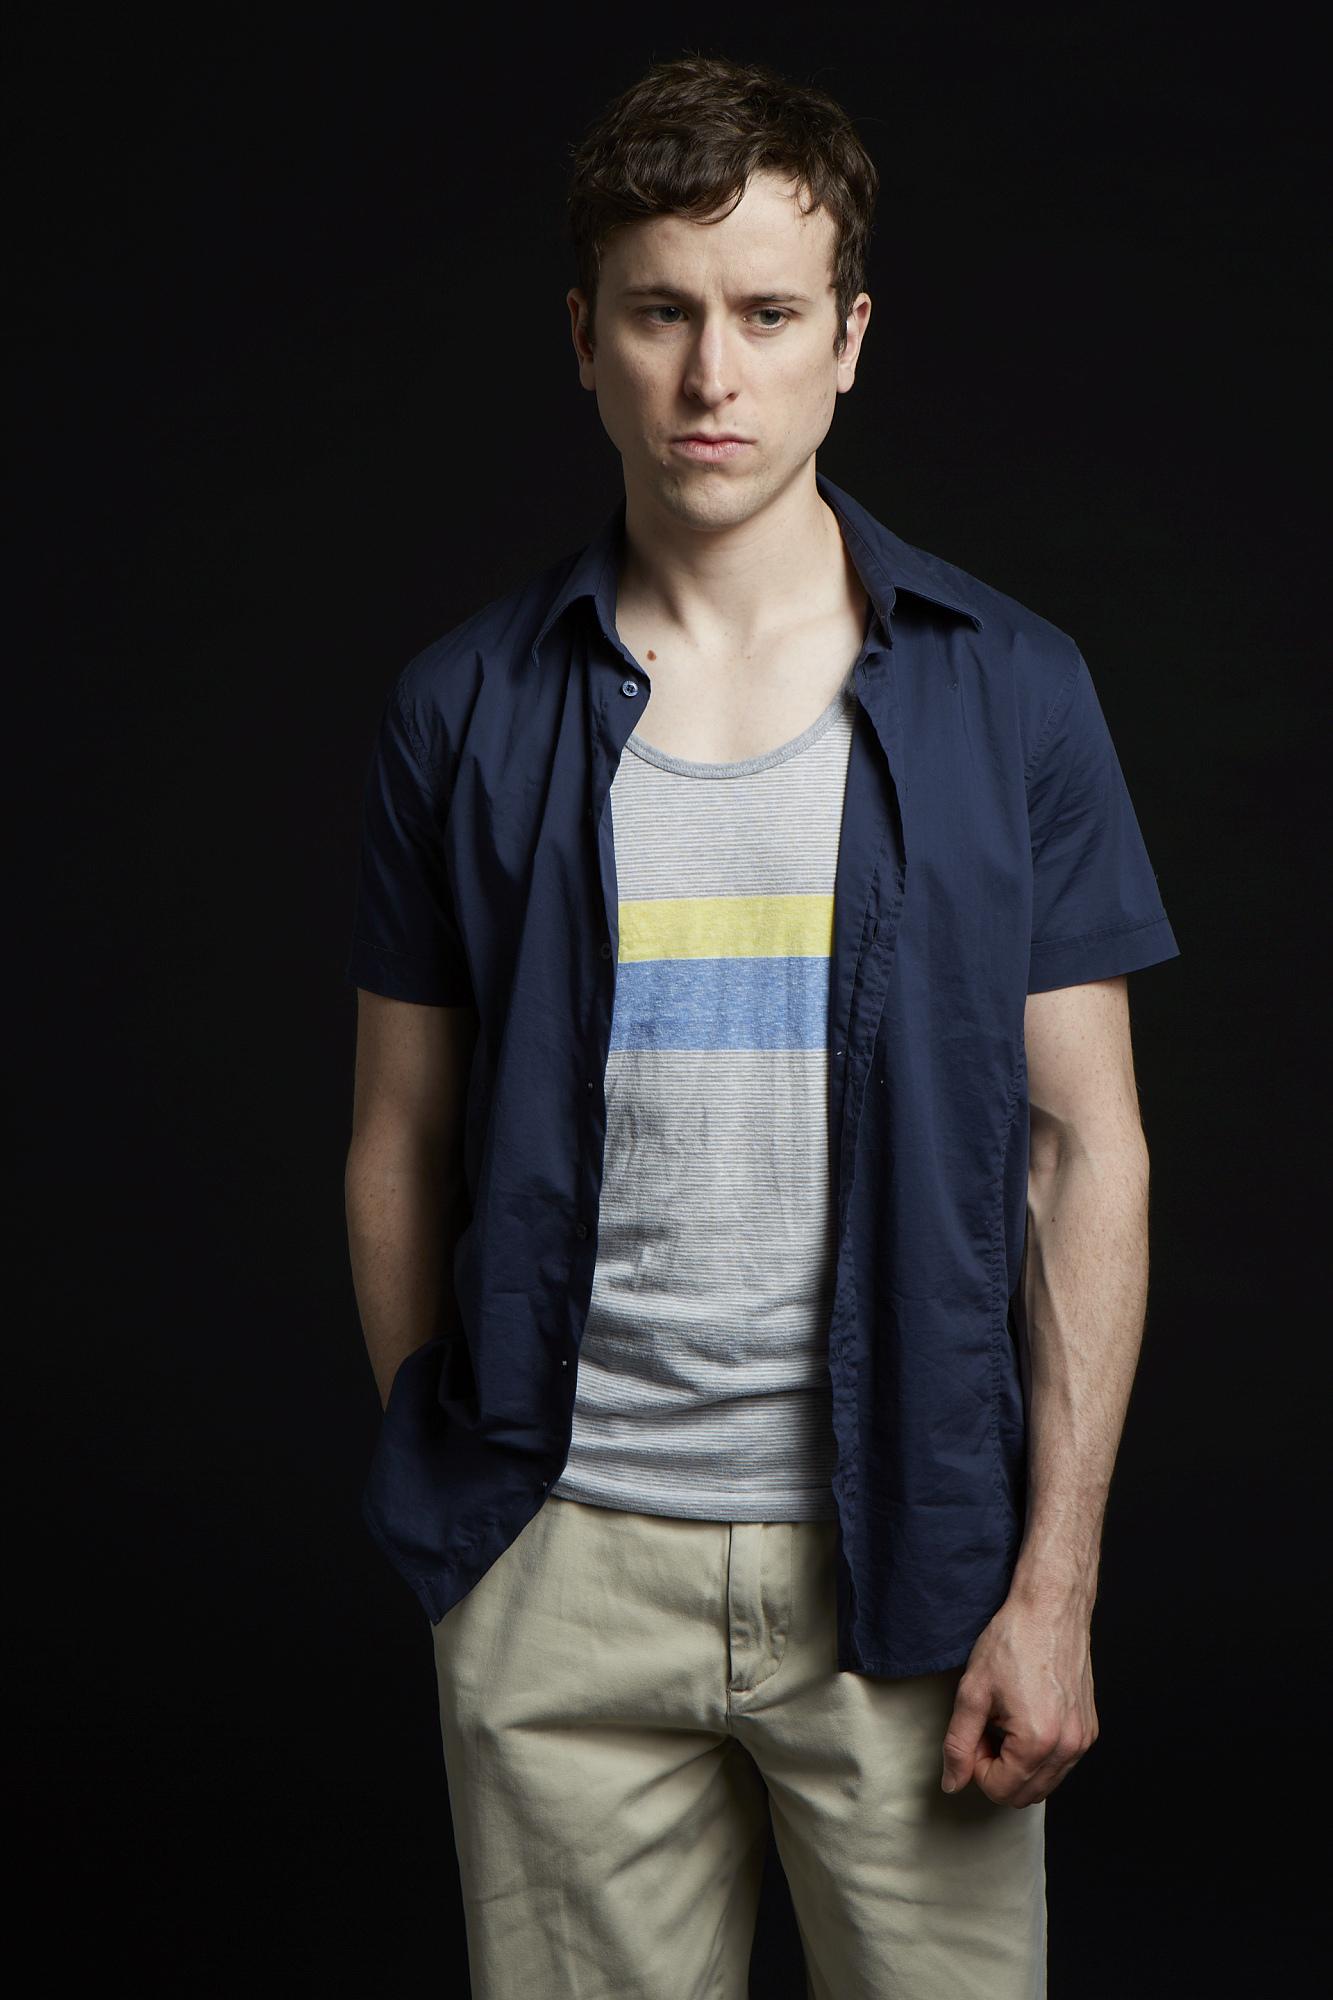 Stephen James Anthony as Ryan